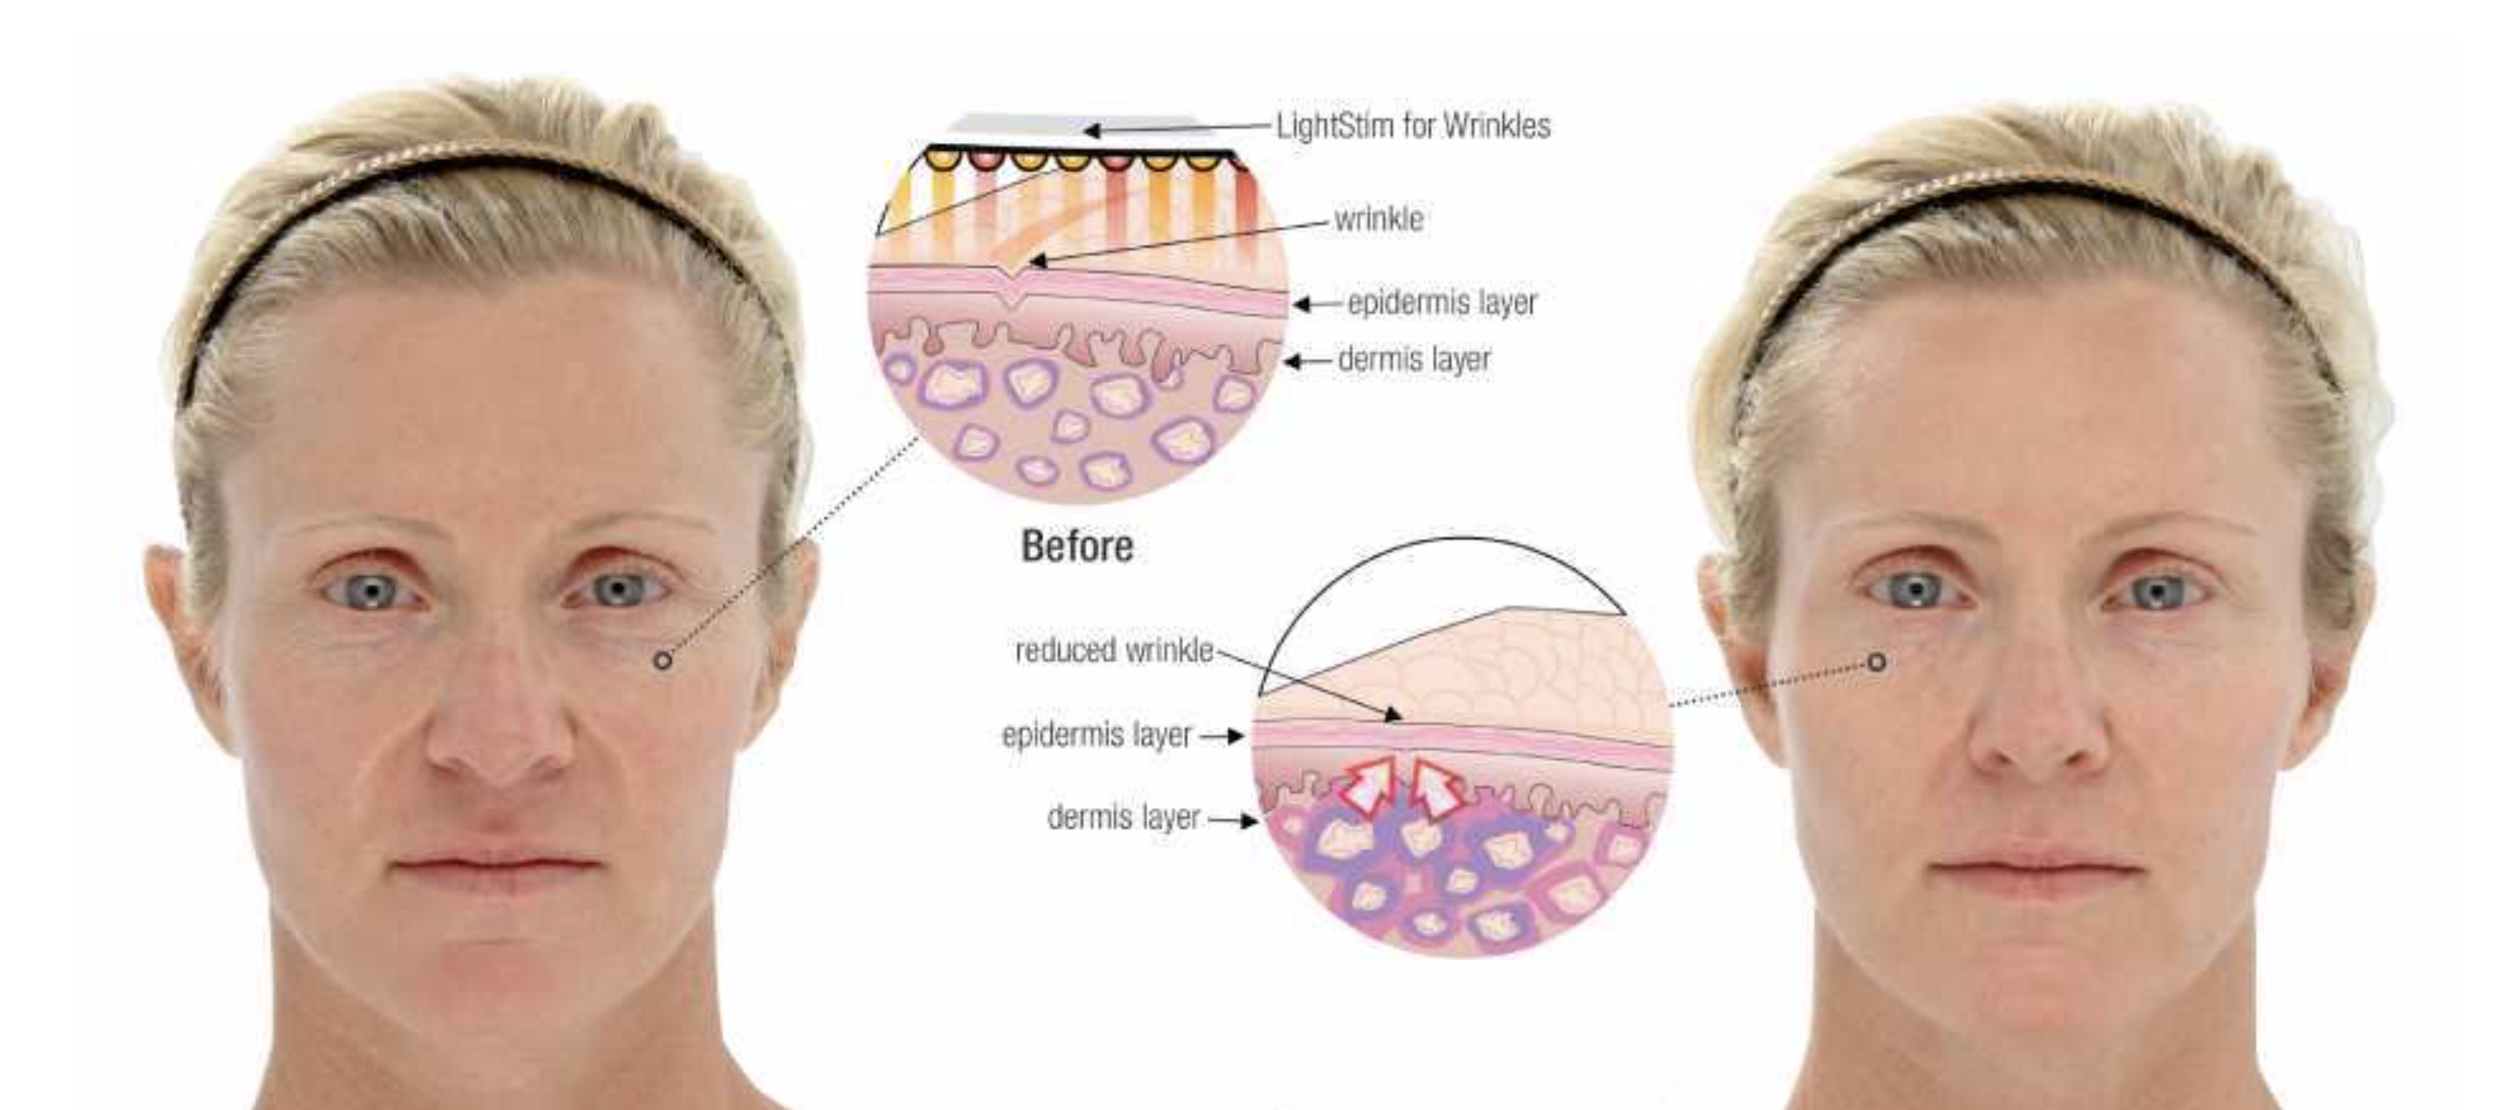 LED LightStim Facial Results RejuvCryo & Wellness.png